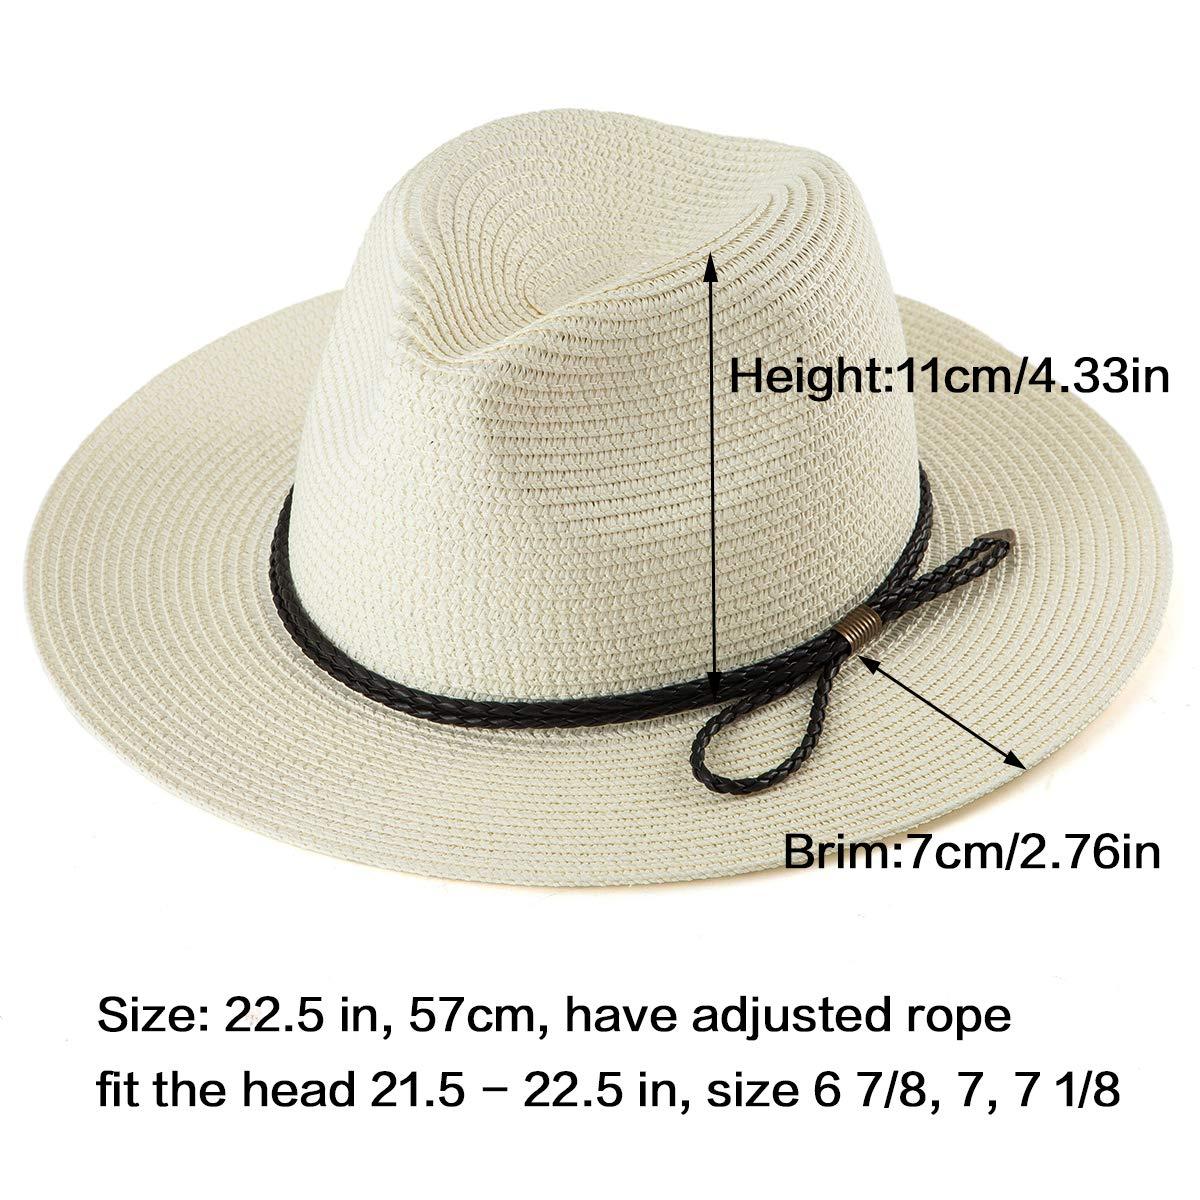 2f8eea888 LADYBRO Straw Fedora Hat Men Cap - Milk White Straw Hat Summer ...